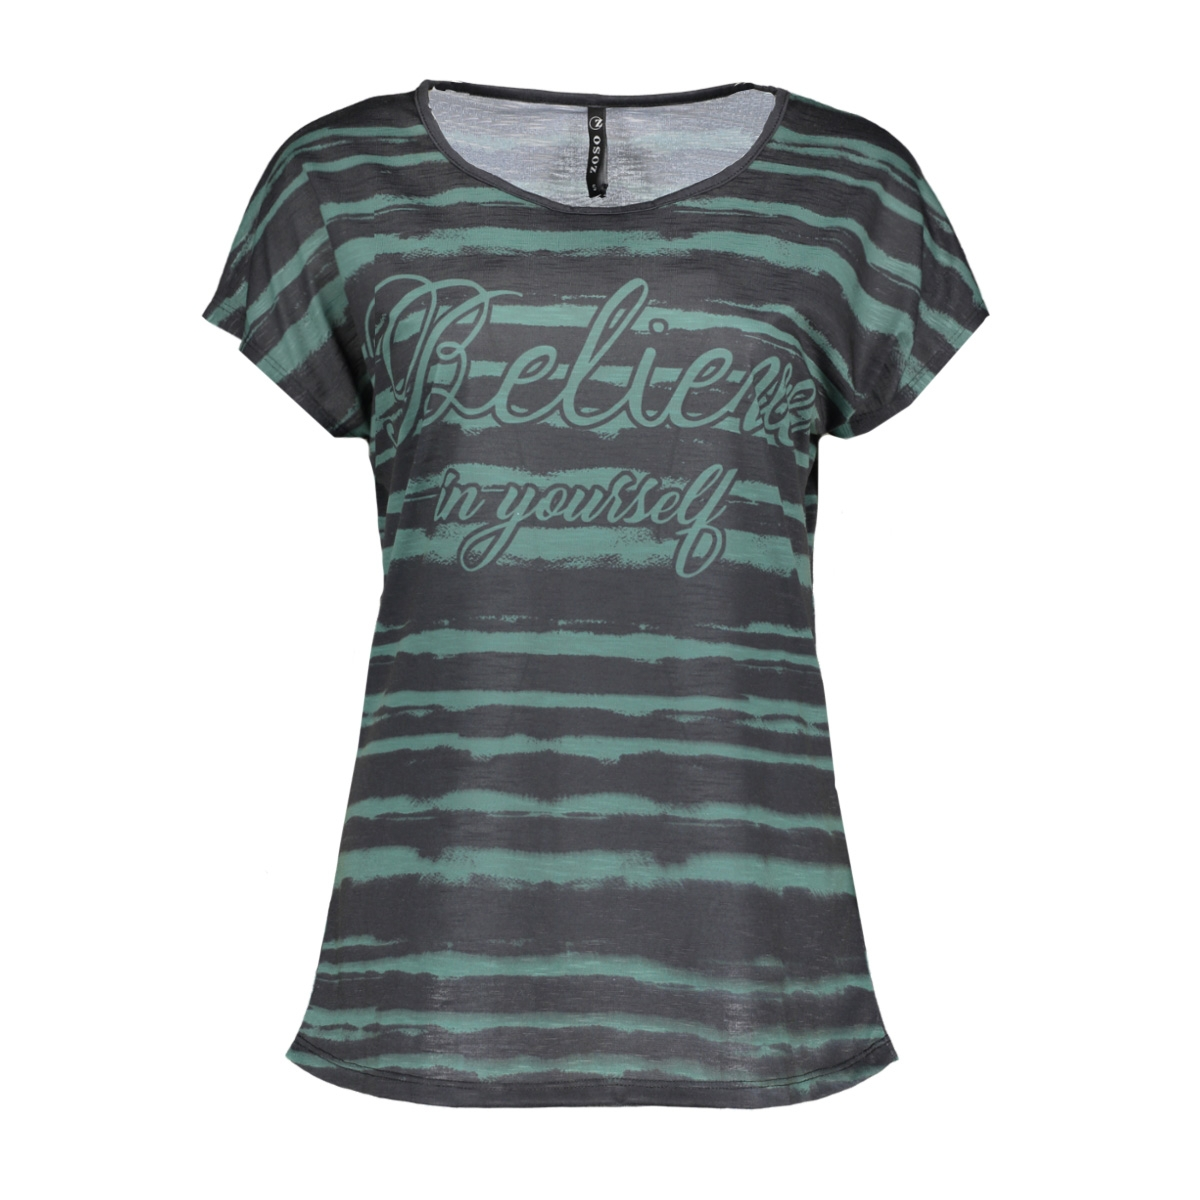 kim zoso t-shirt mint/black